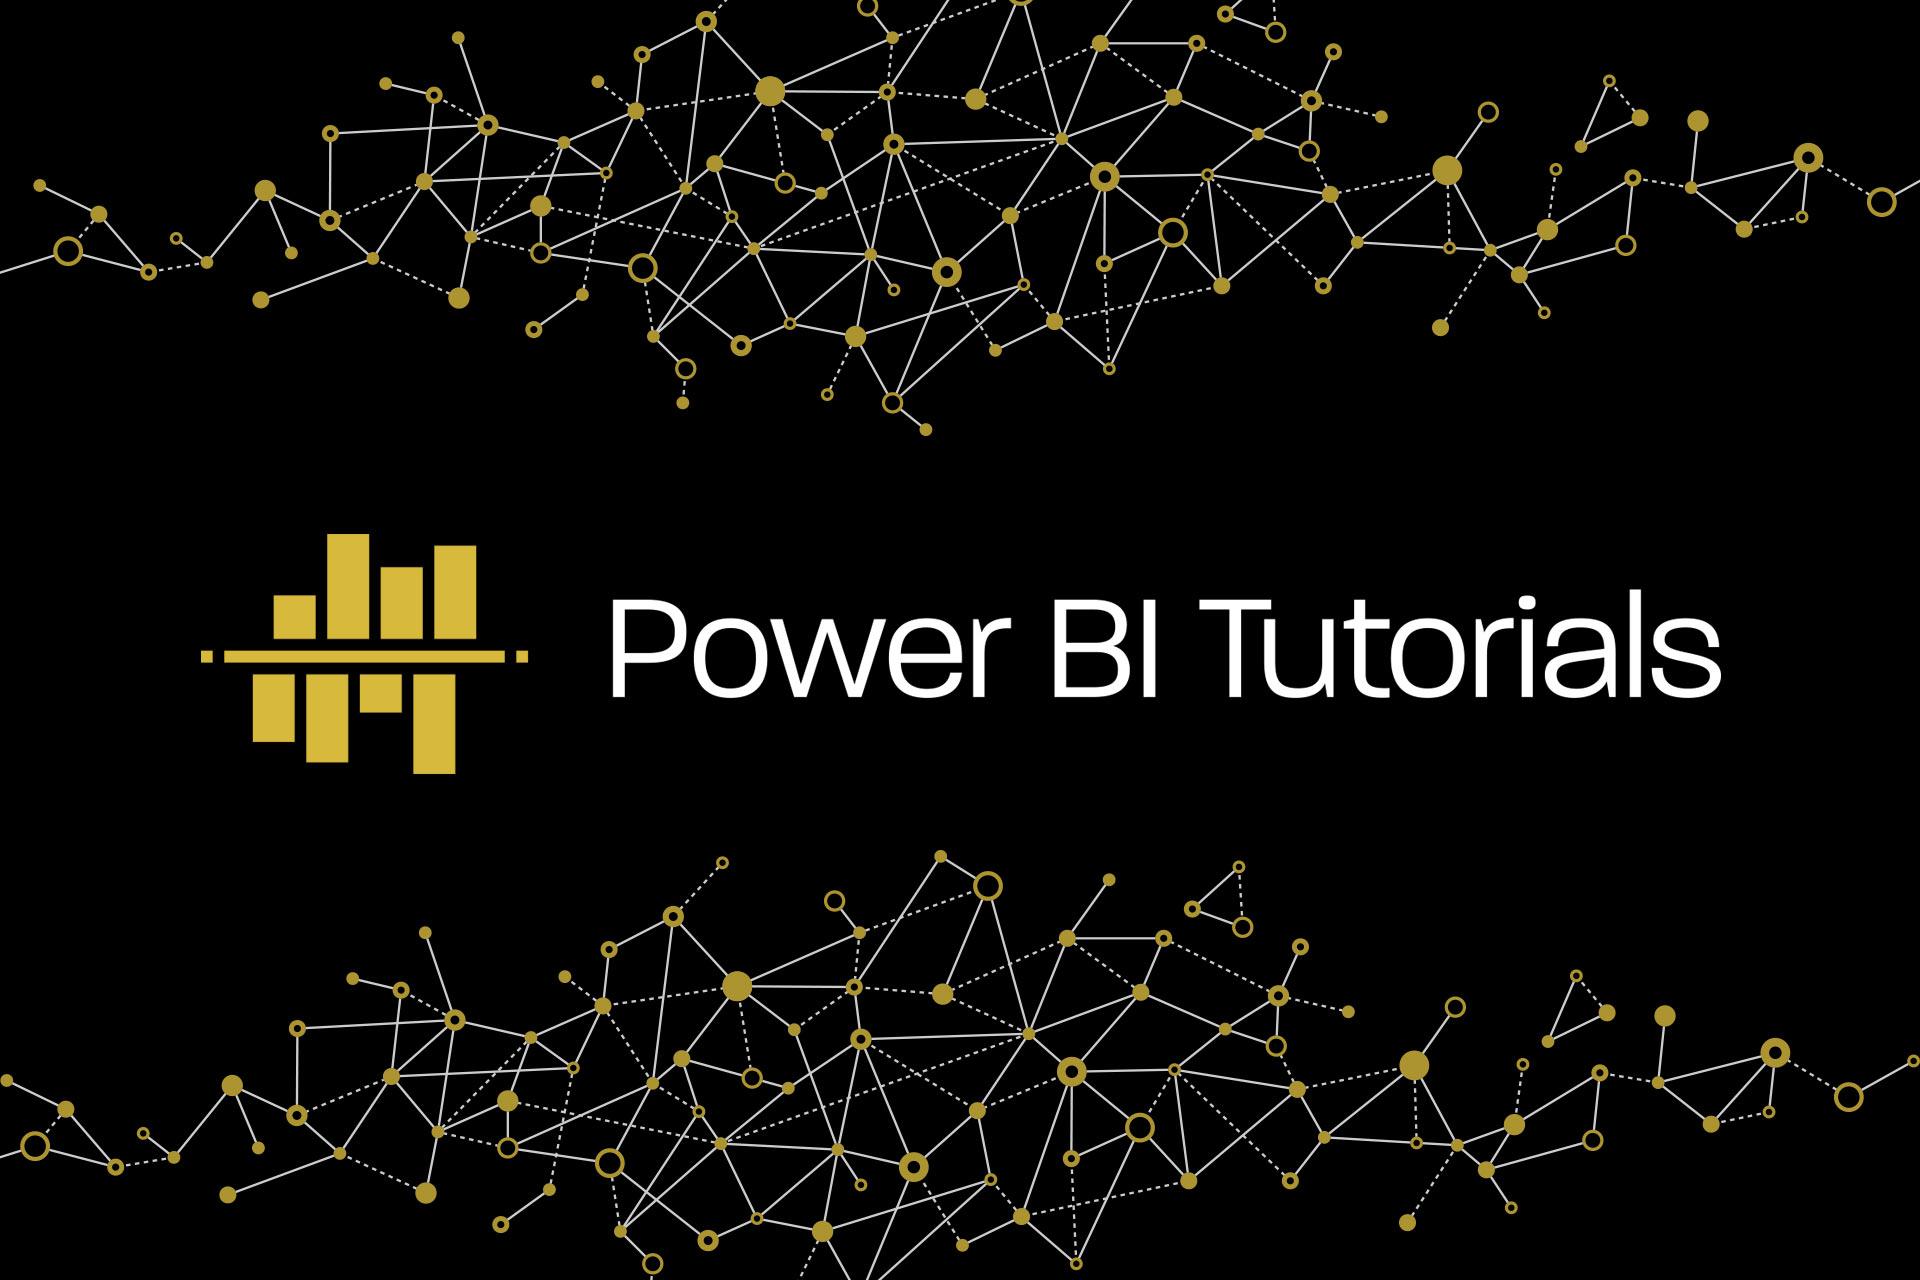 Power BI Reports vs Dashboards